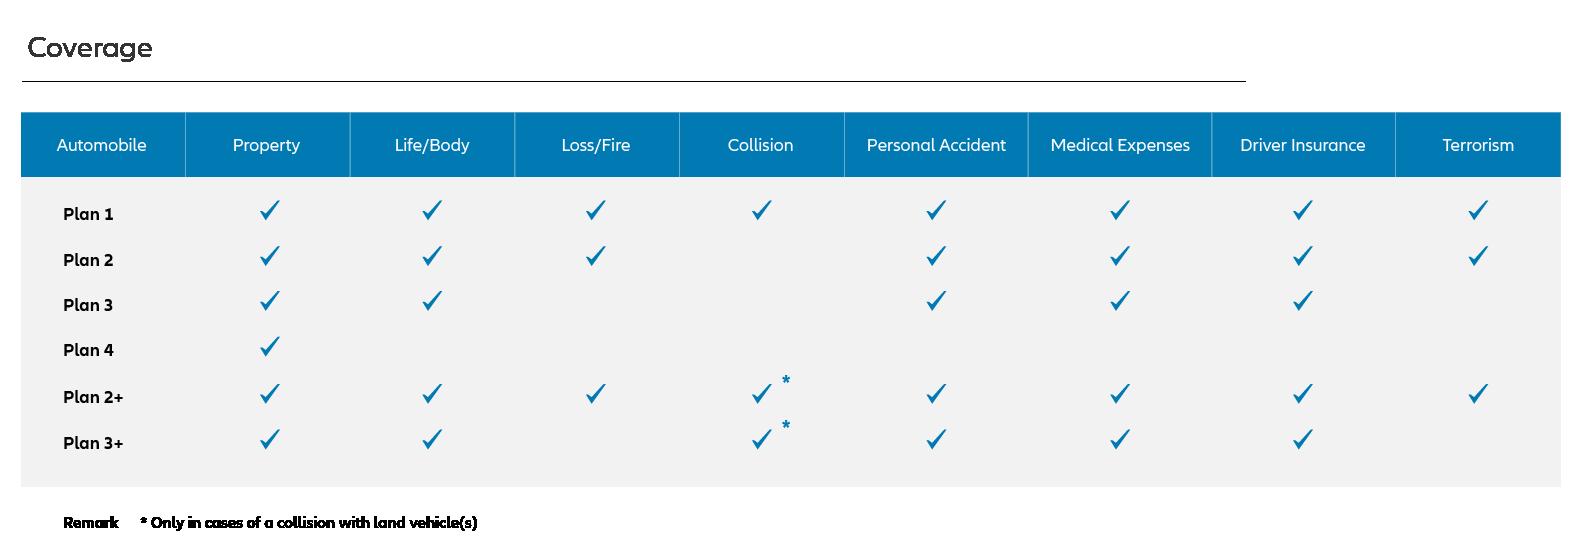 Automobile Insurance Plan